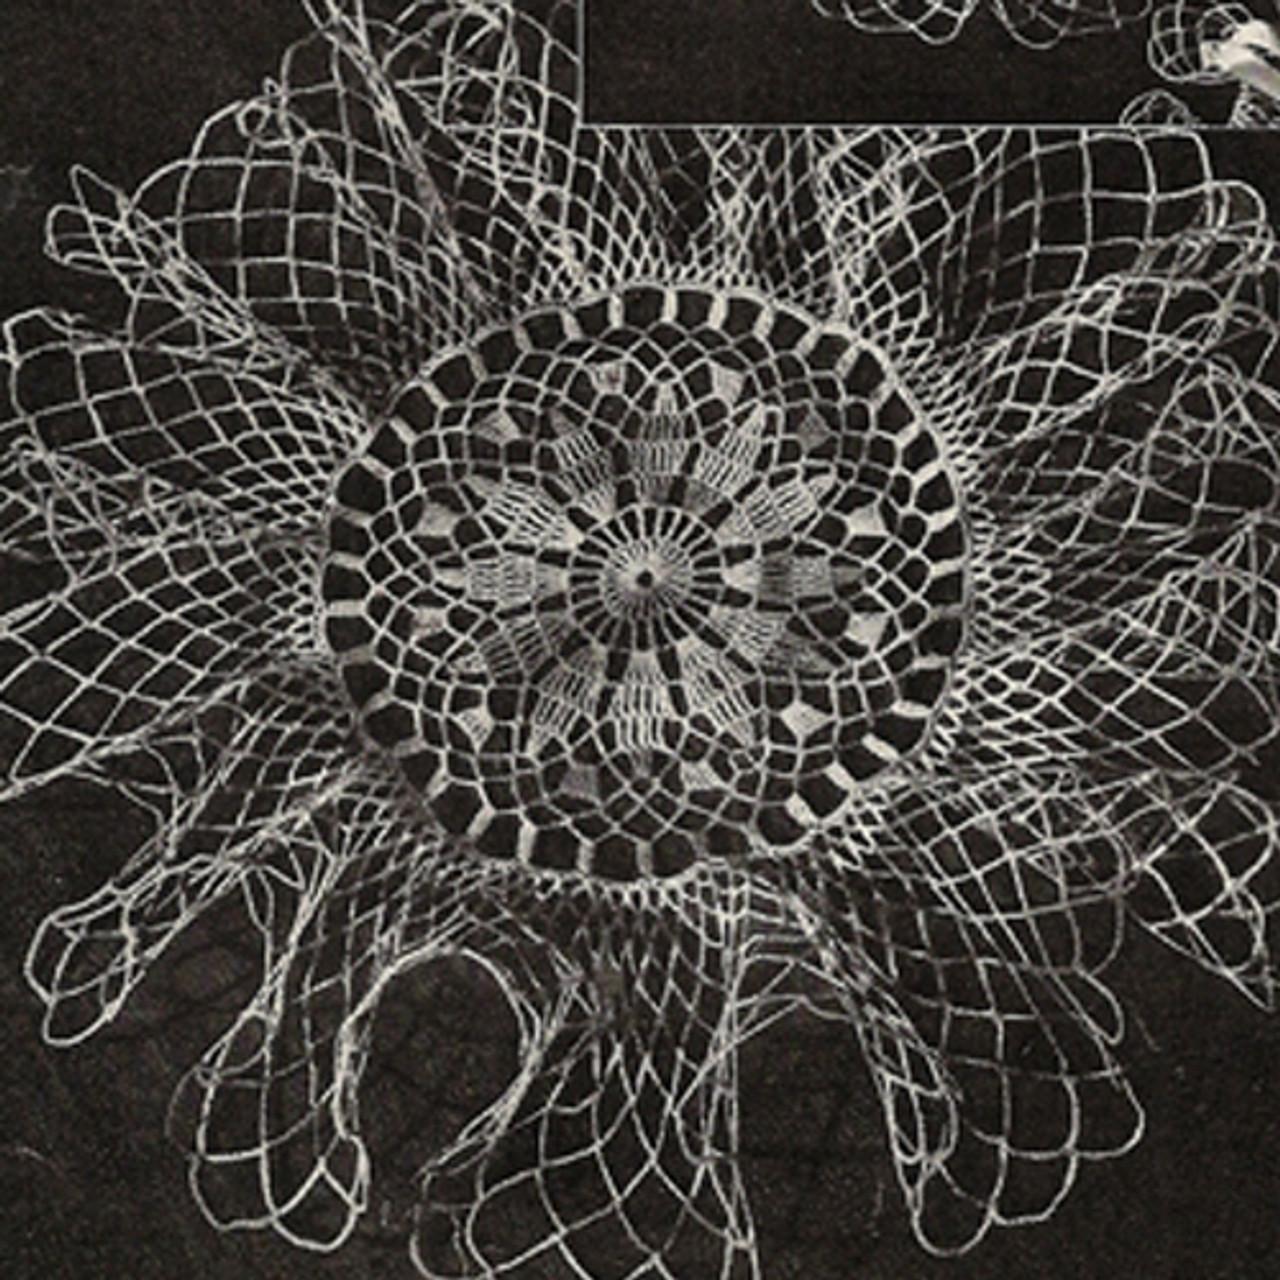 Lily Mills Small Ruffled Doily Crochet Pattern